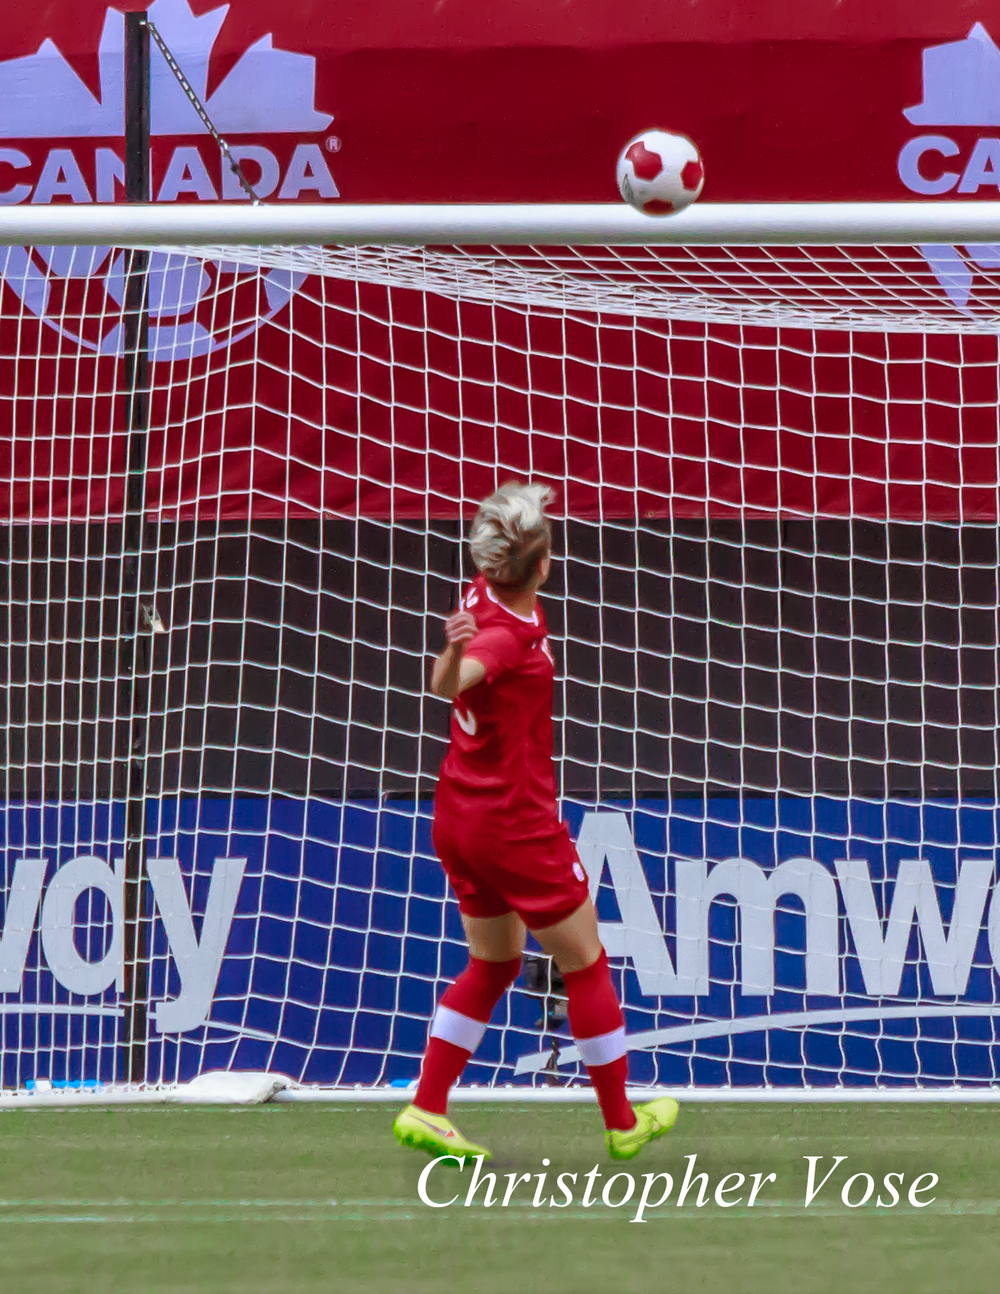 2014-06-18 Sophie Schmidt Goal.jpg